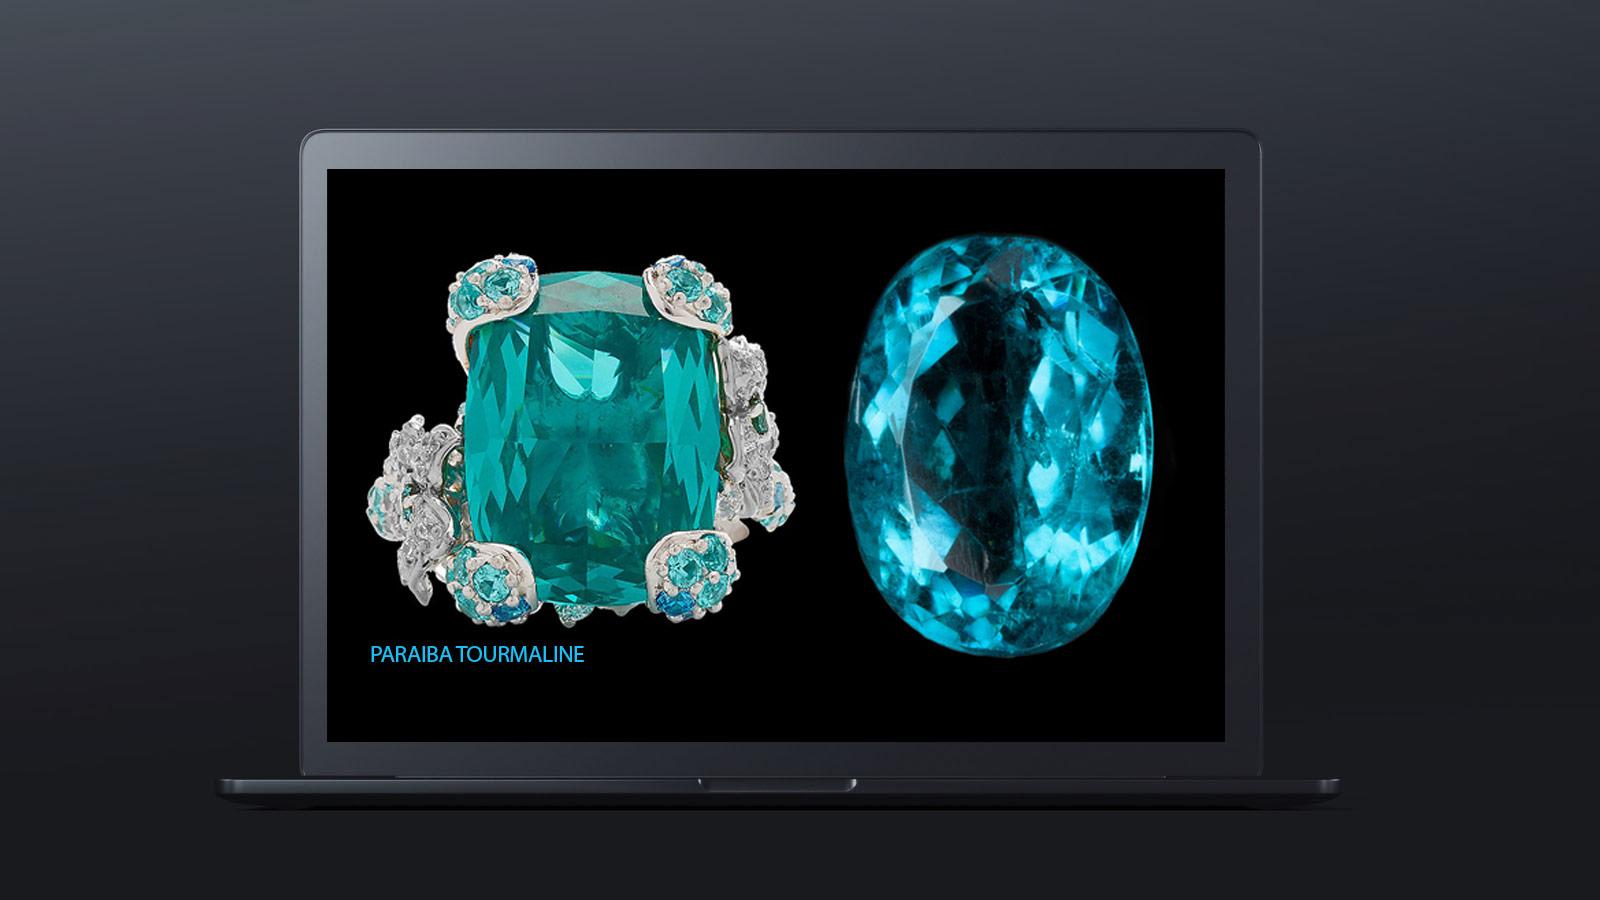 10 worlds rarest gemstones PARAIBA TOURMALINE 2 - ده گوهر کمیاب دنیا کدامند؟